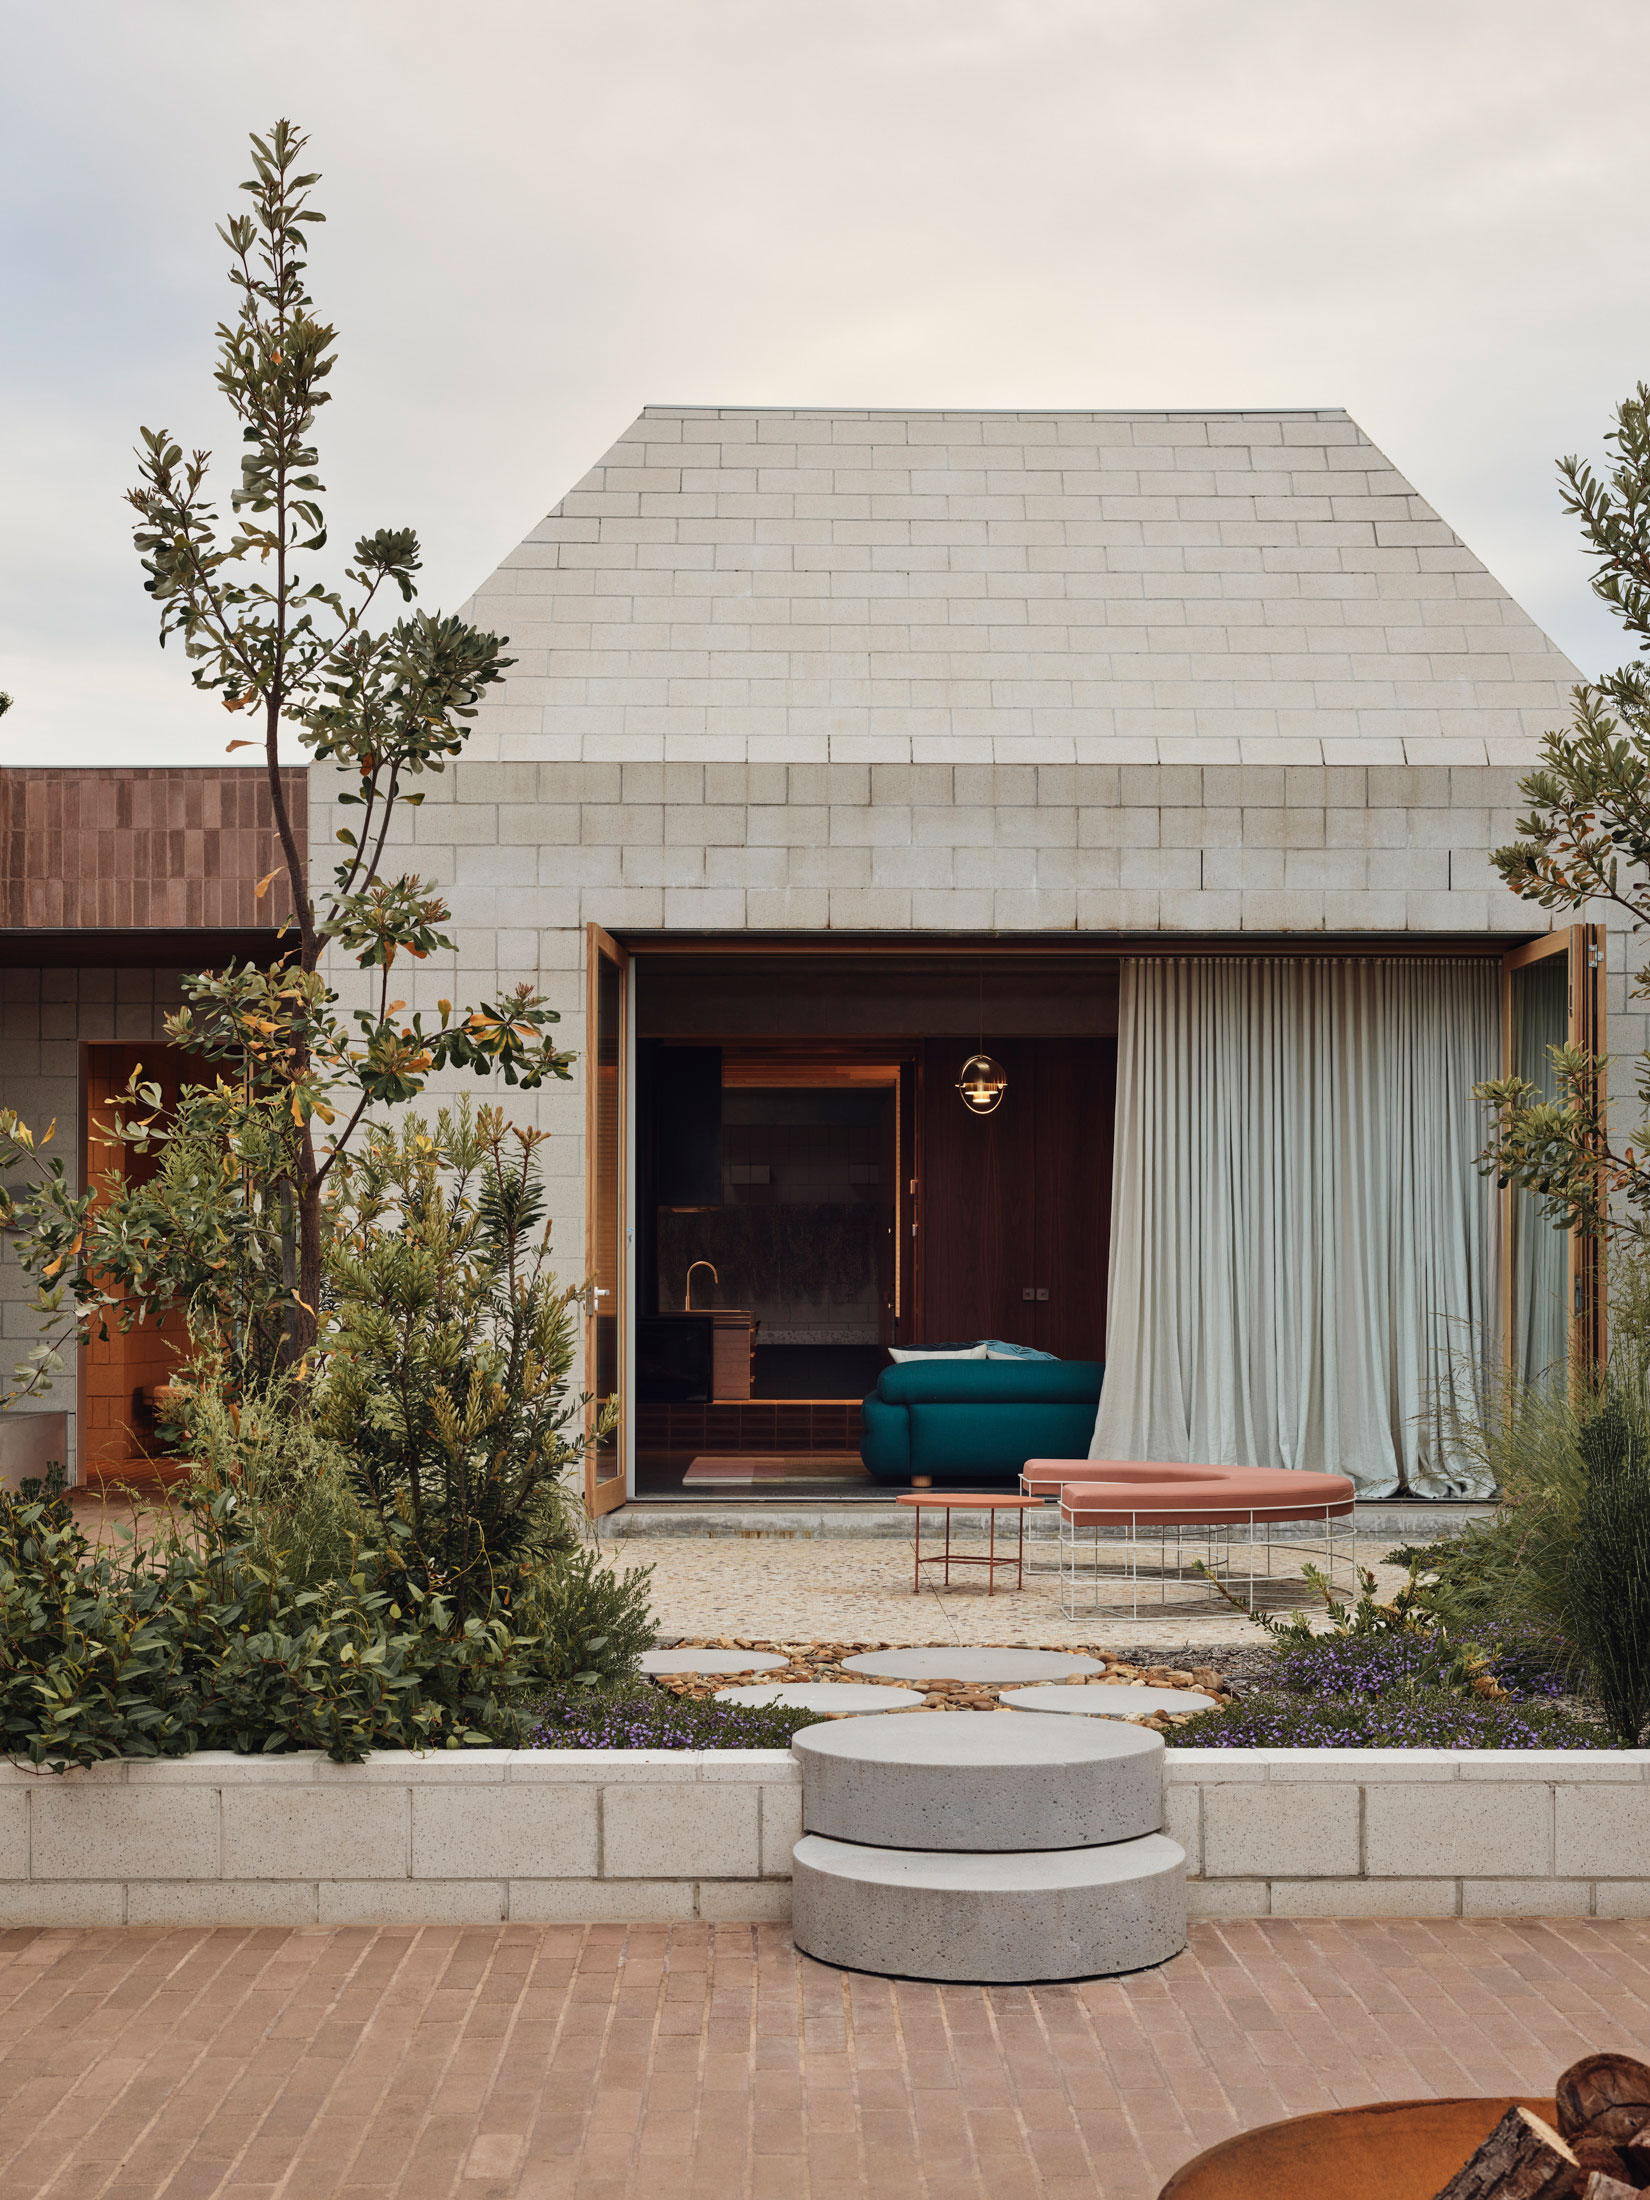 Architects Eat Bellows Beach House Flinders Masonry Architecture Photo Derek Swalwell Yellowtrace 57